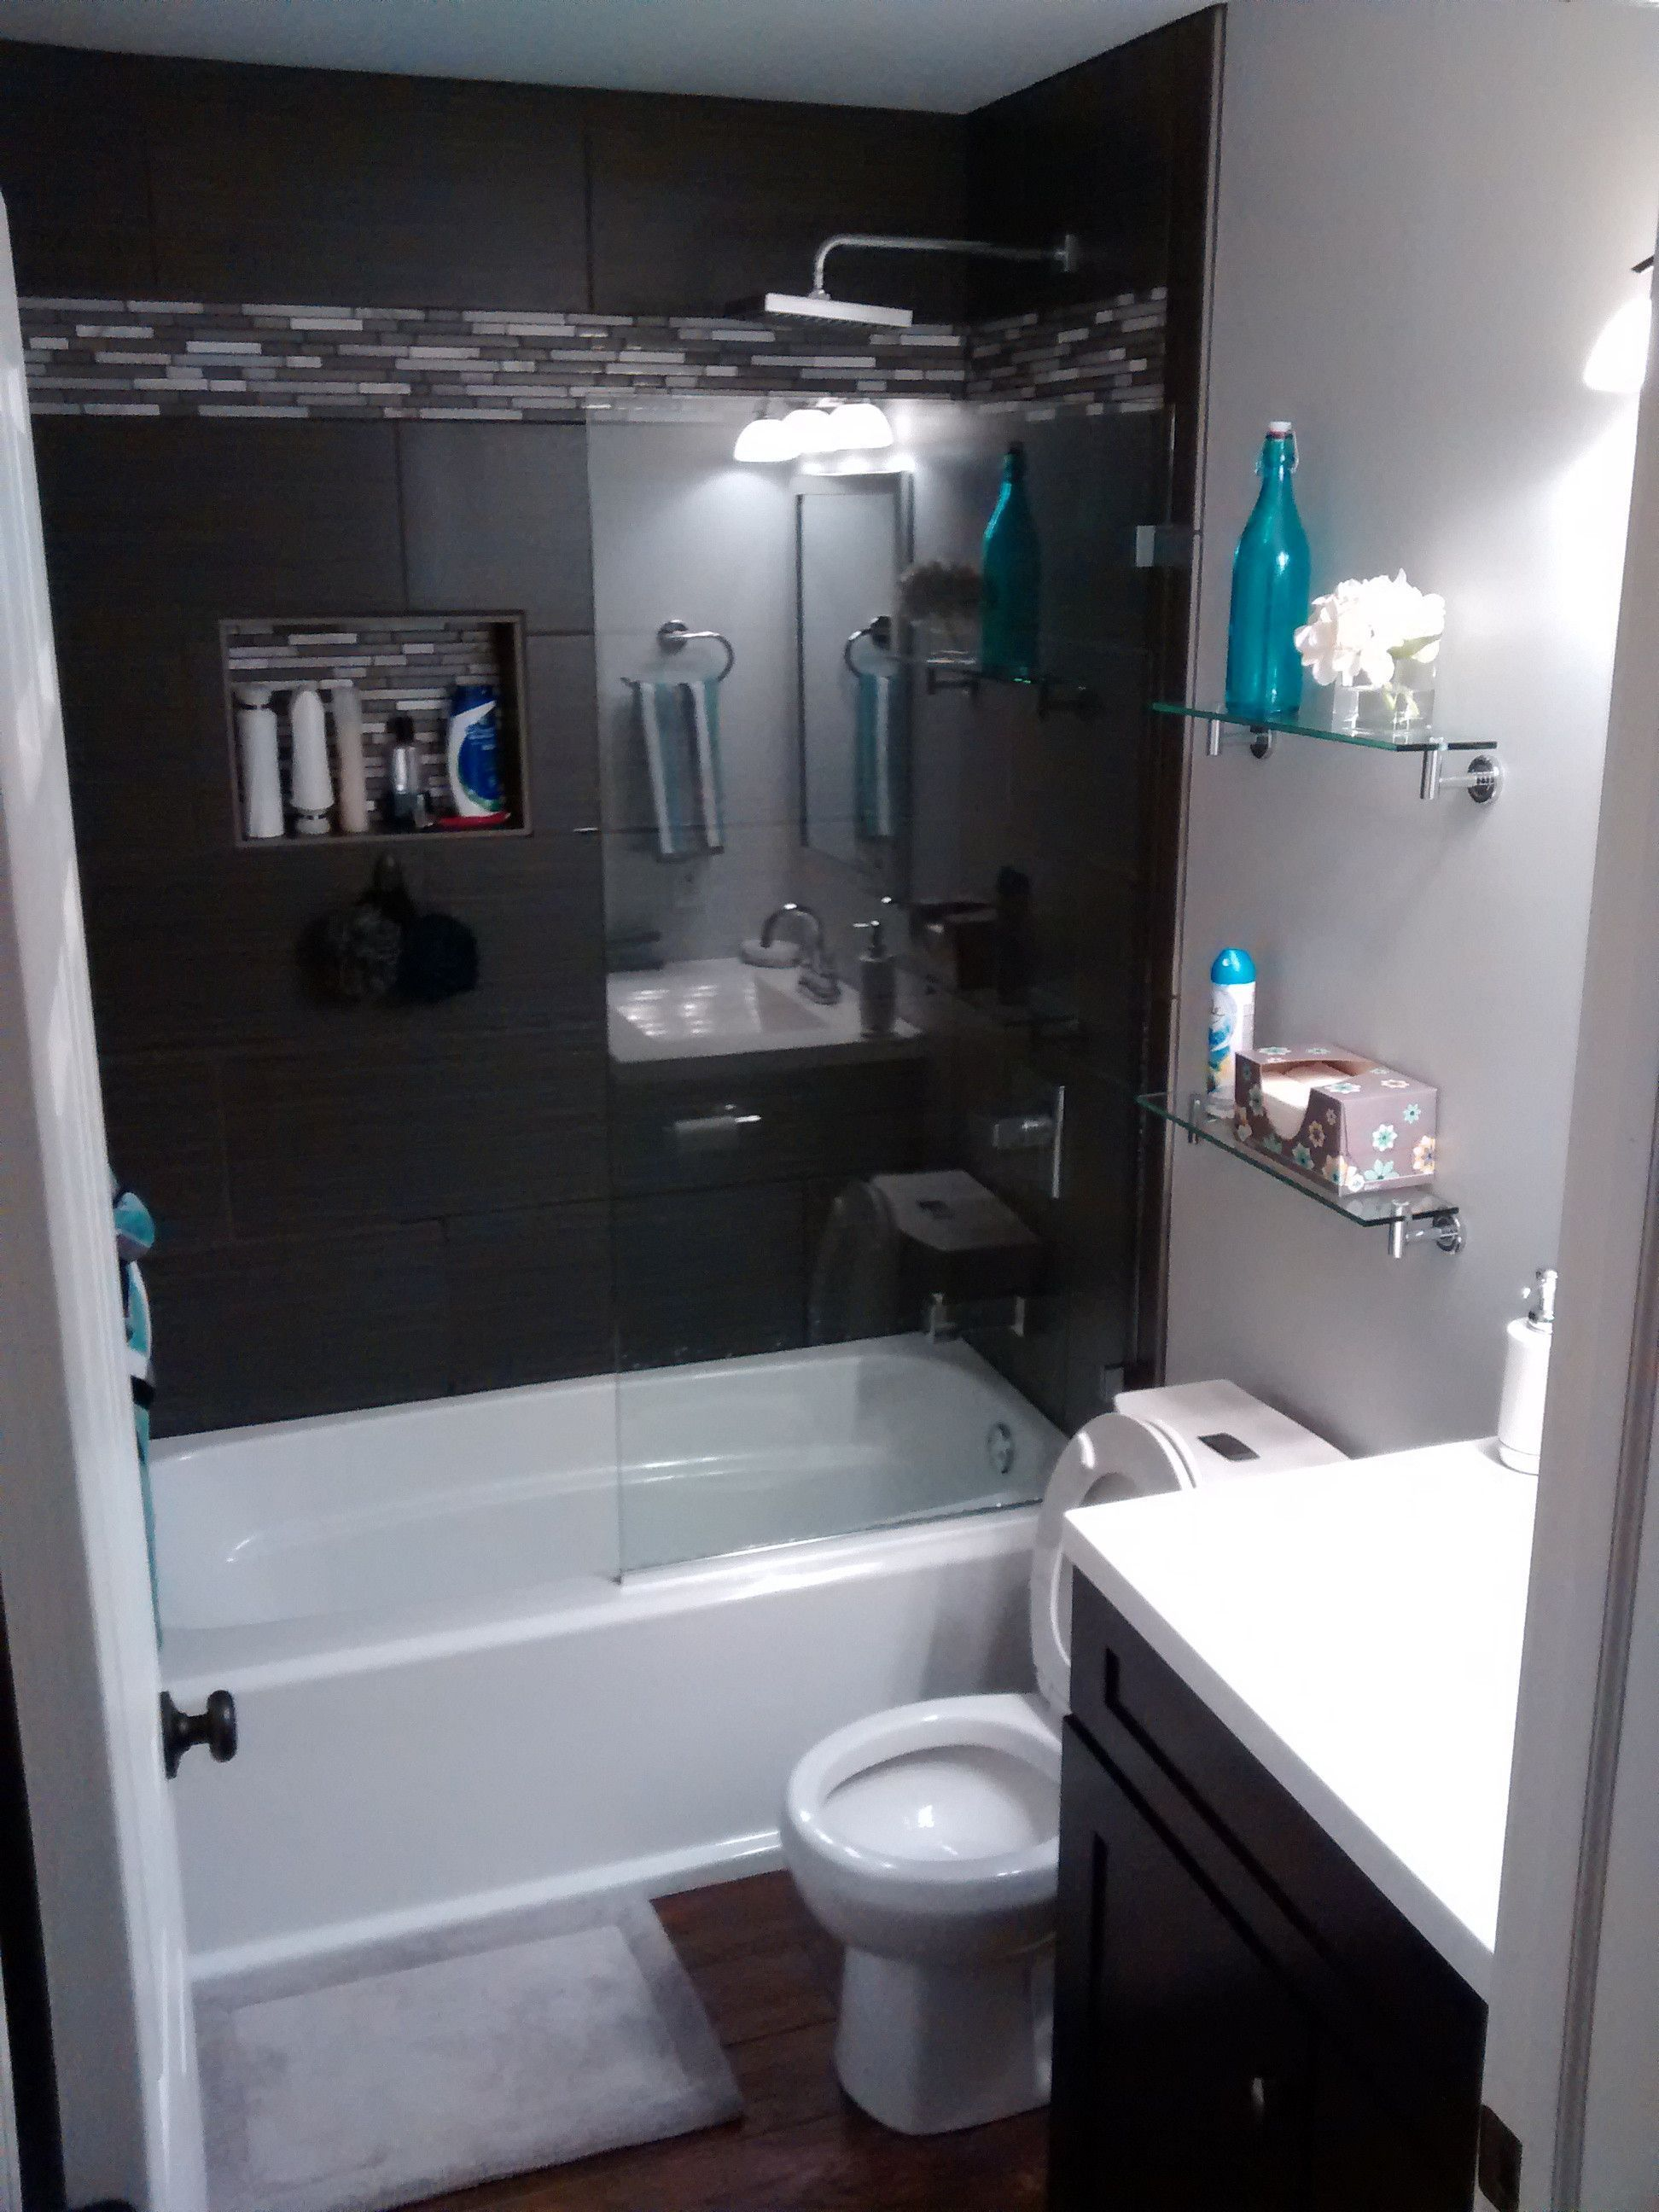 refresh shower makeover bath ideas by bathtub fitters pink remodelaholic bathroom tub of